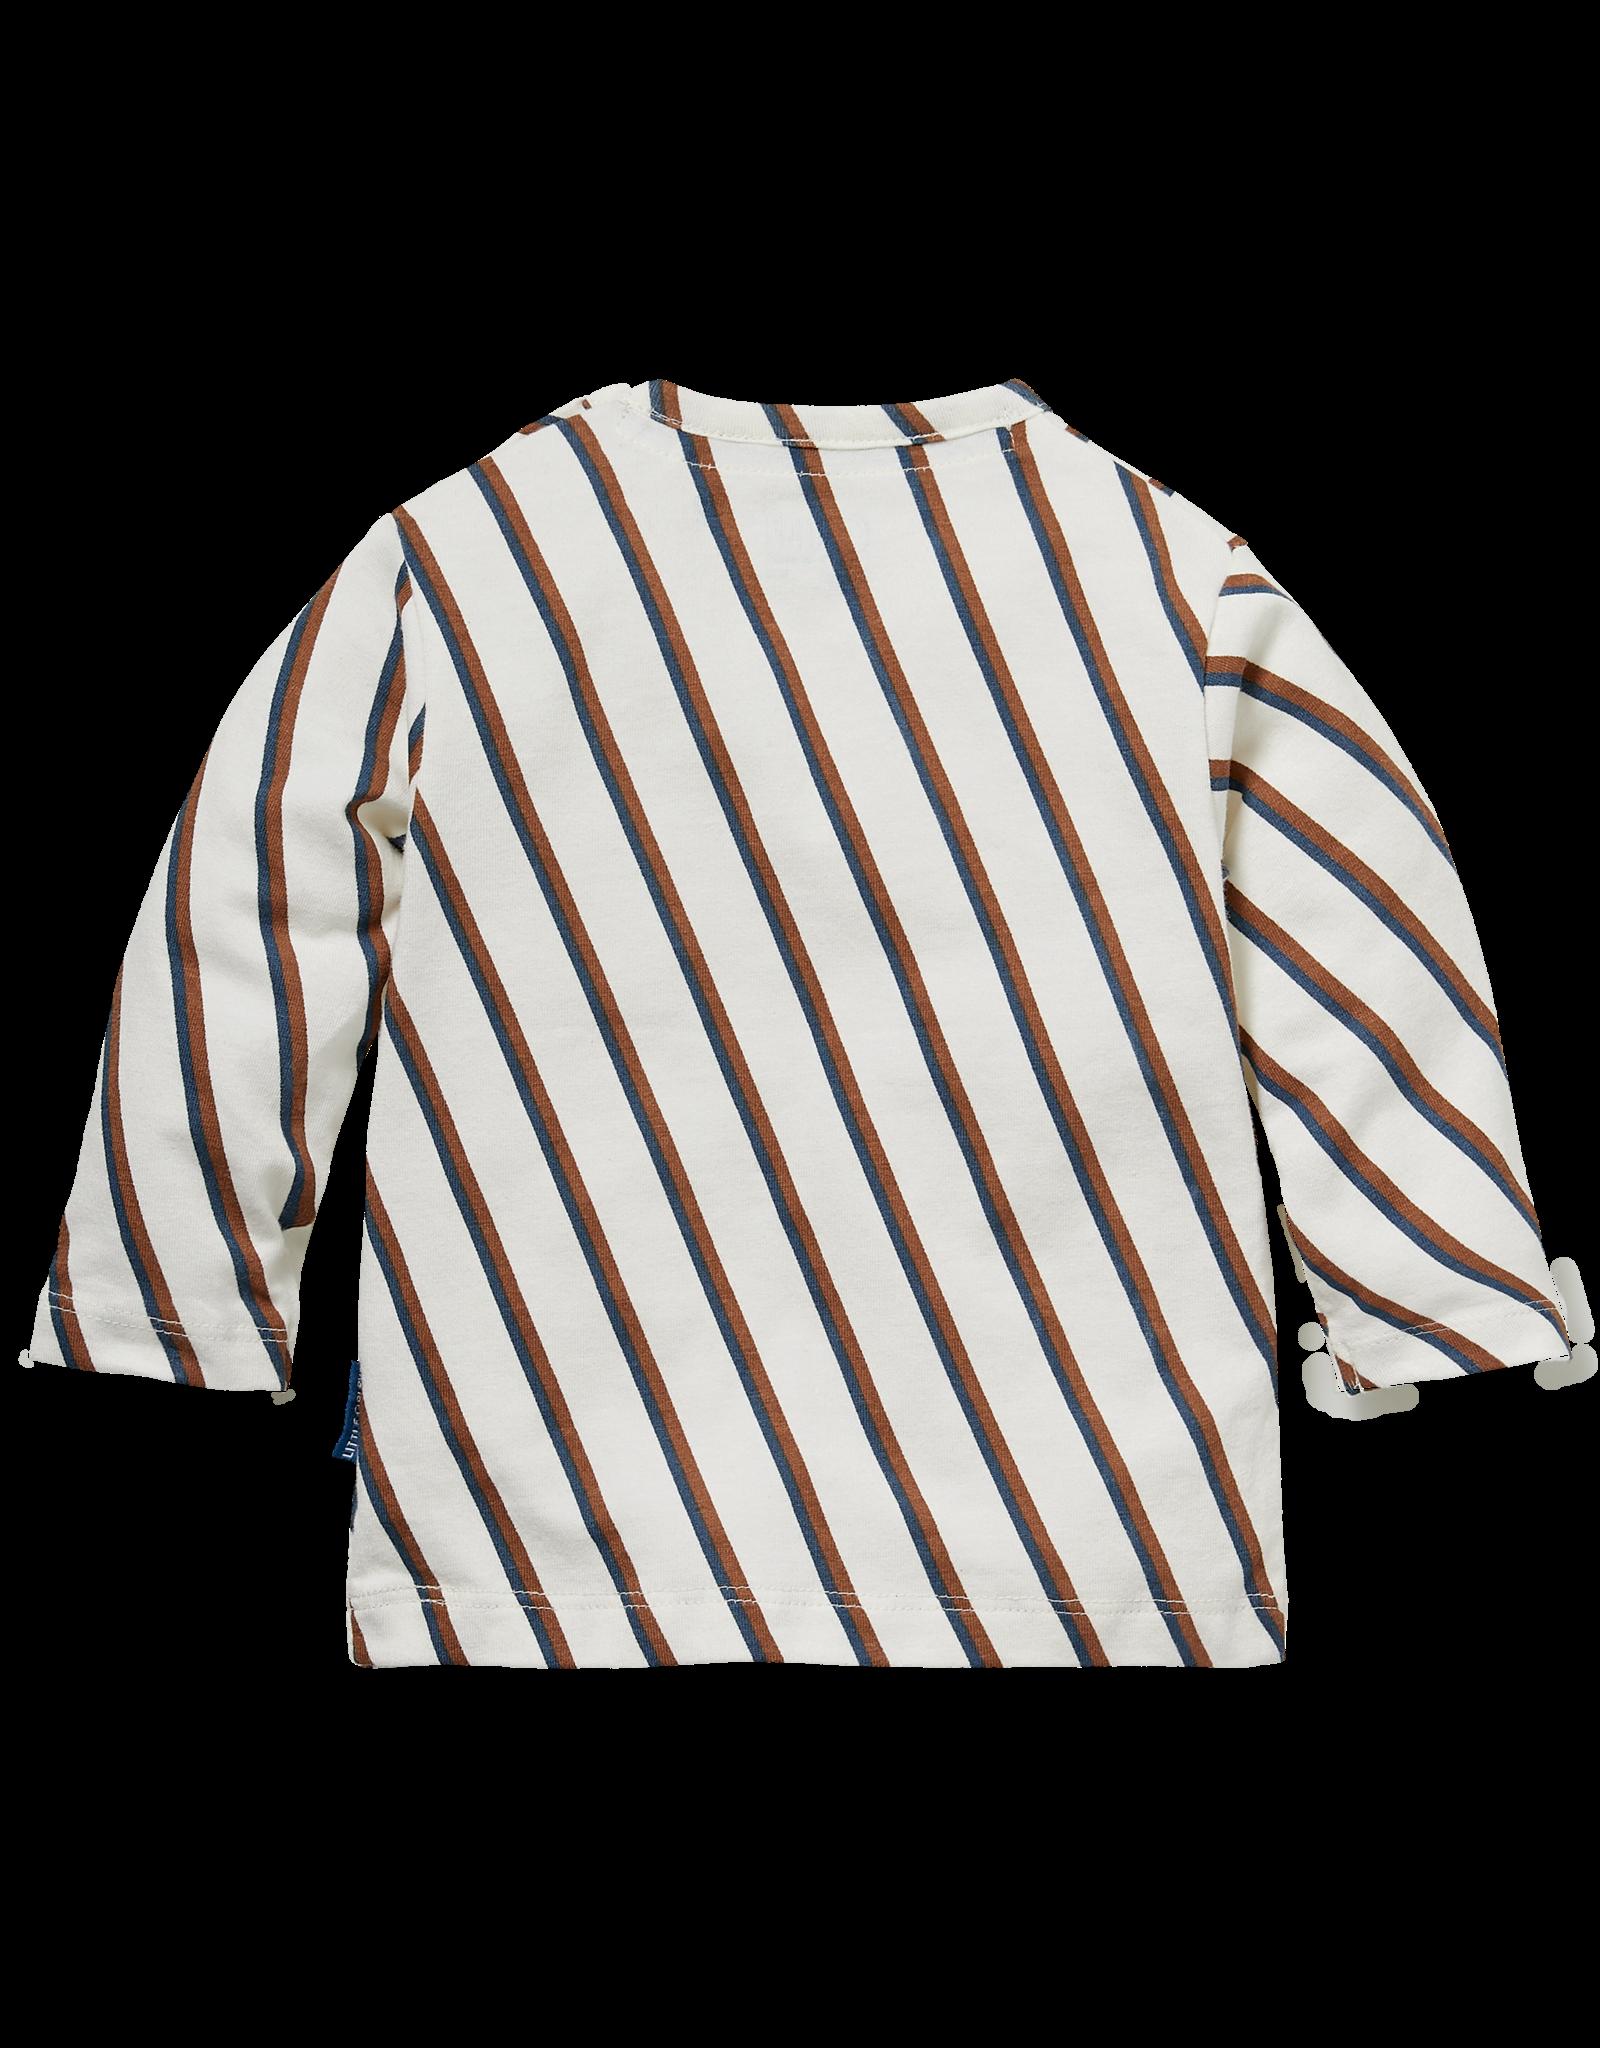 Quapi LONGSLEEVE, NICO , Multi Stripe